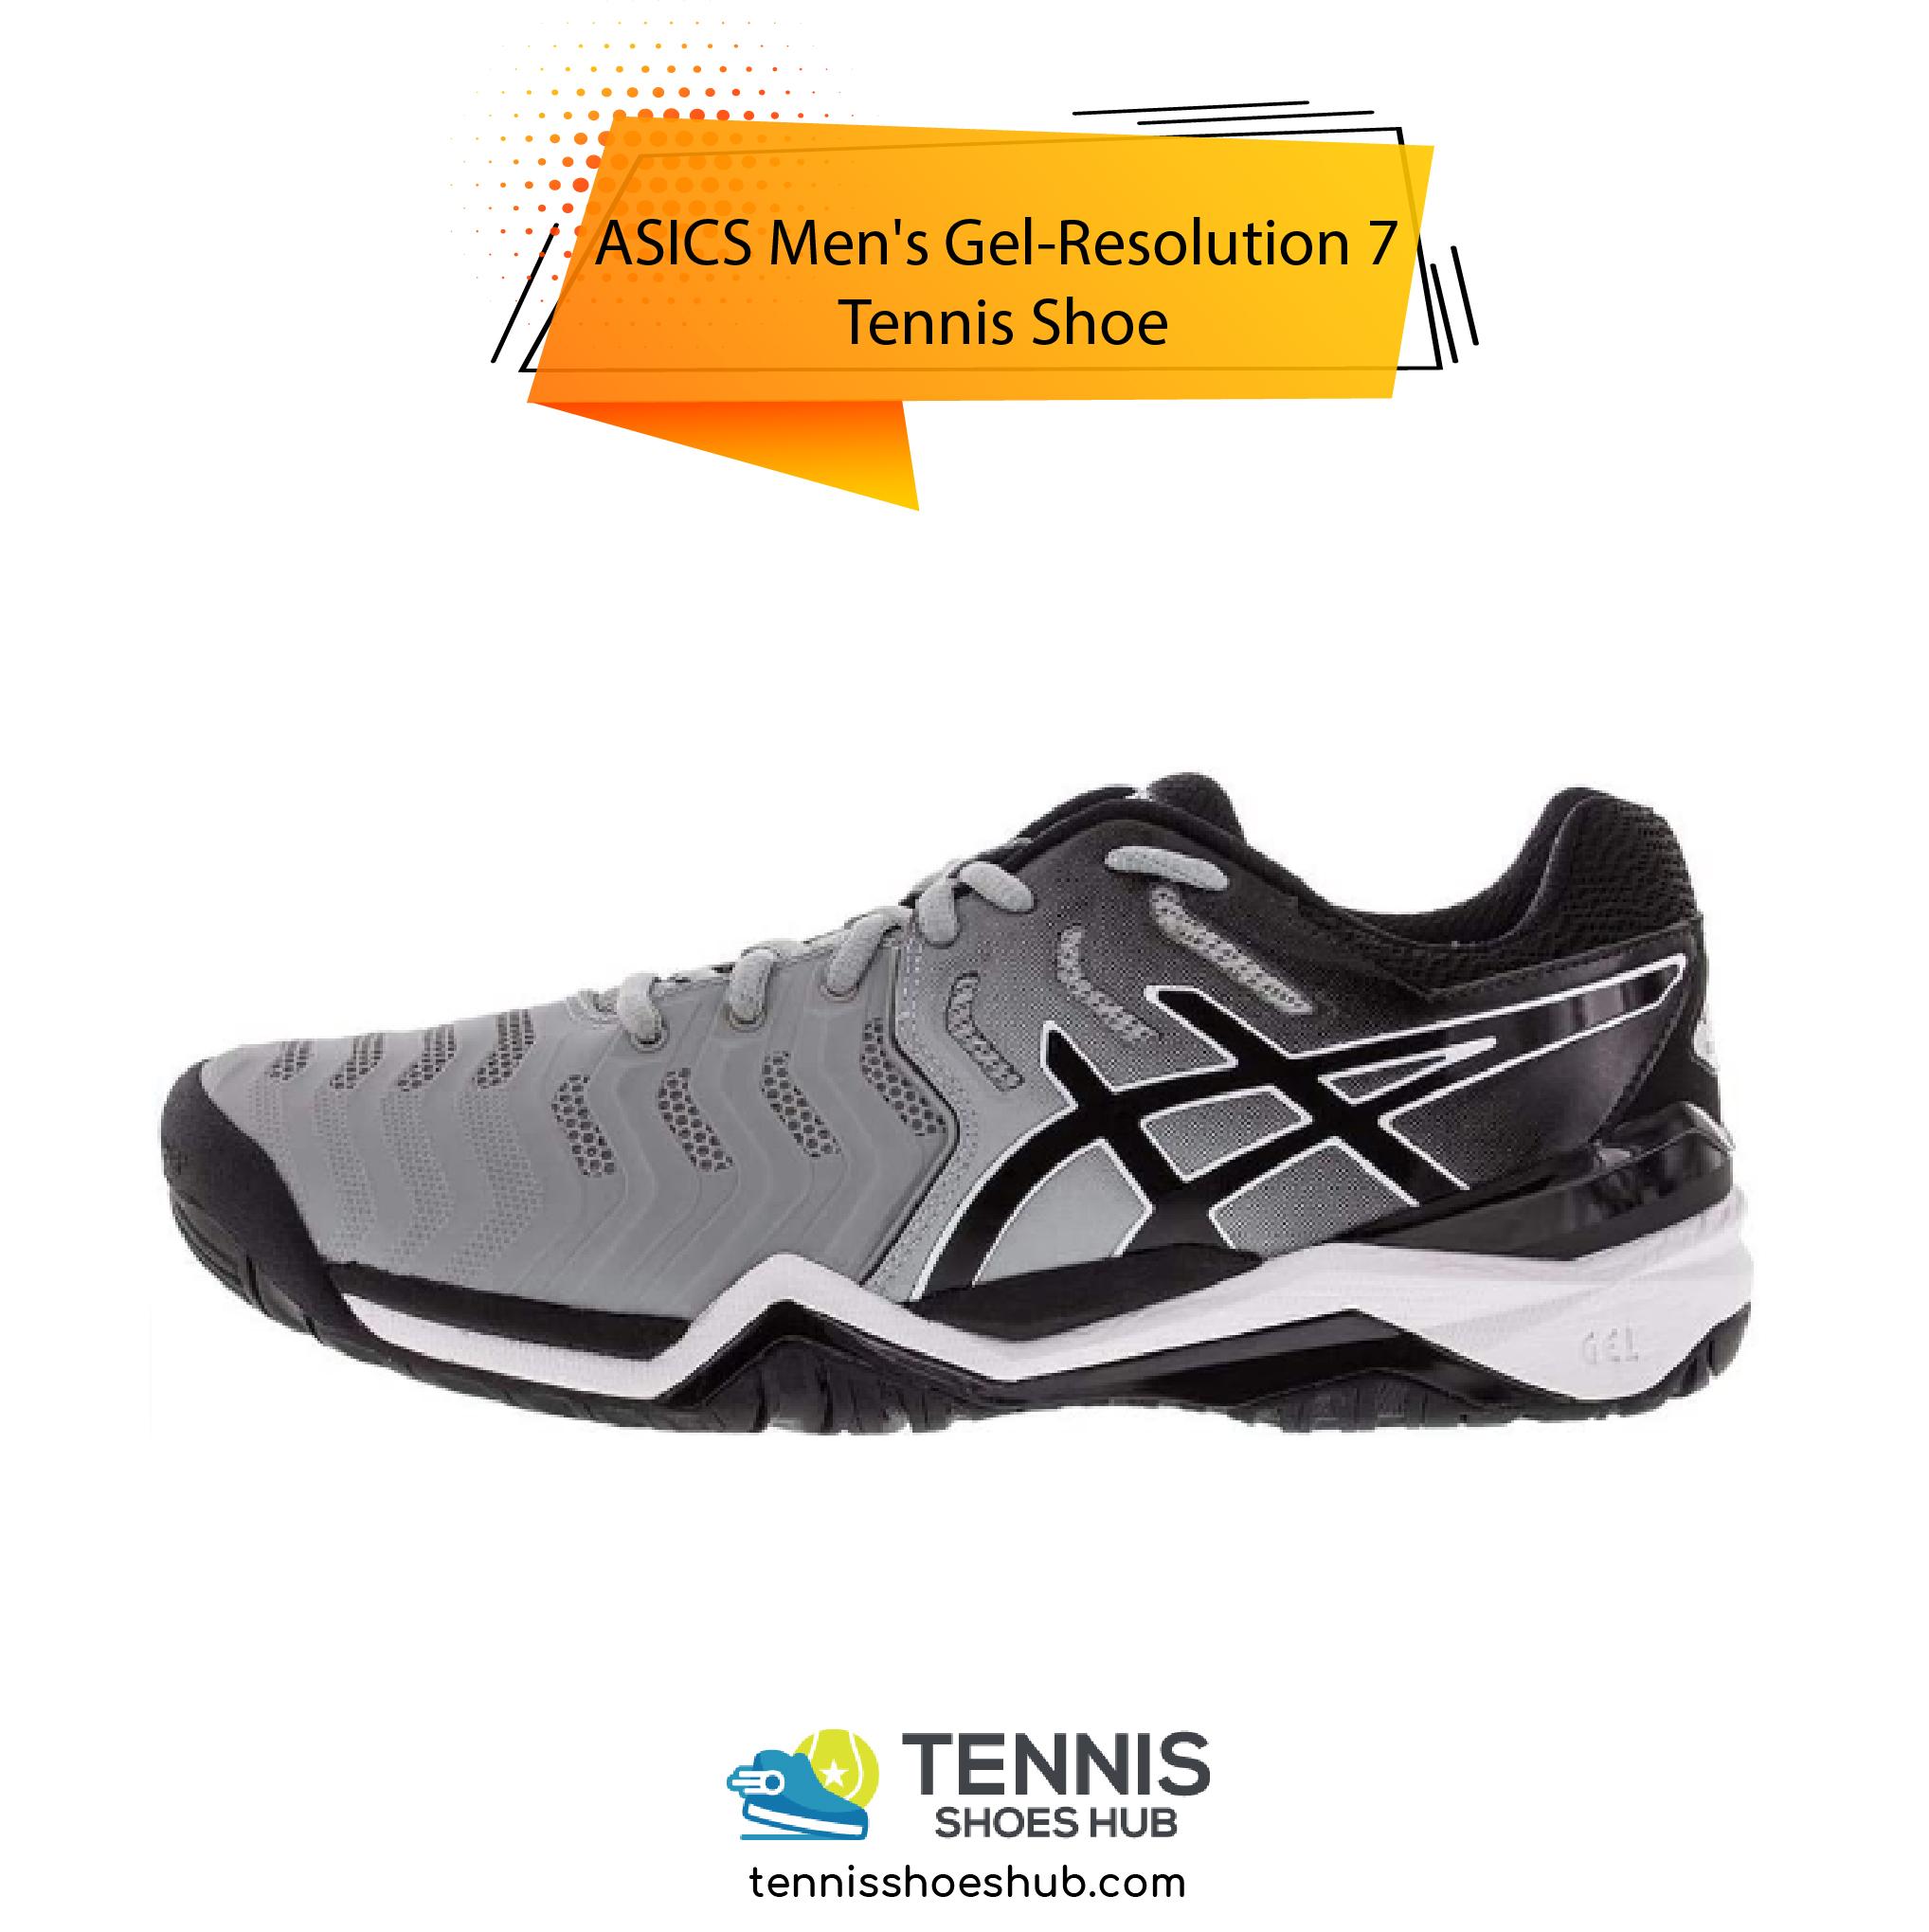 ASICS Mens Gel Resolution 7 Tennis Shoe 01